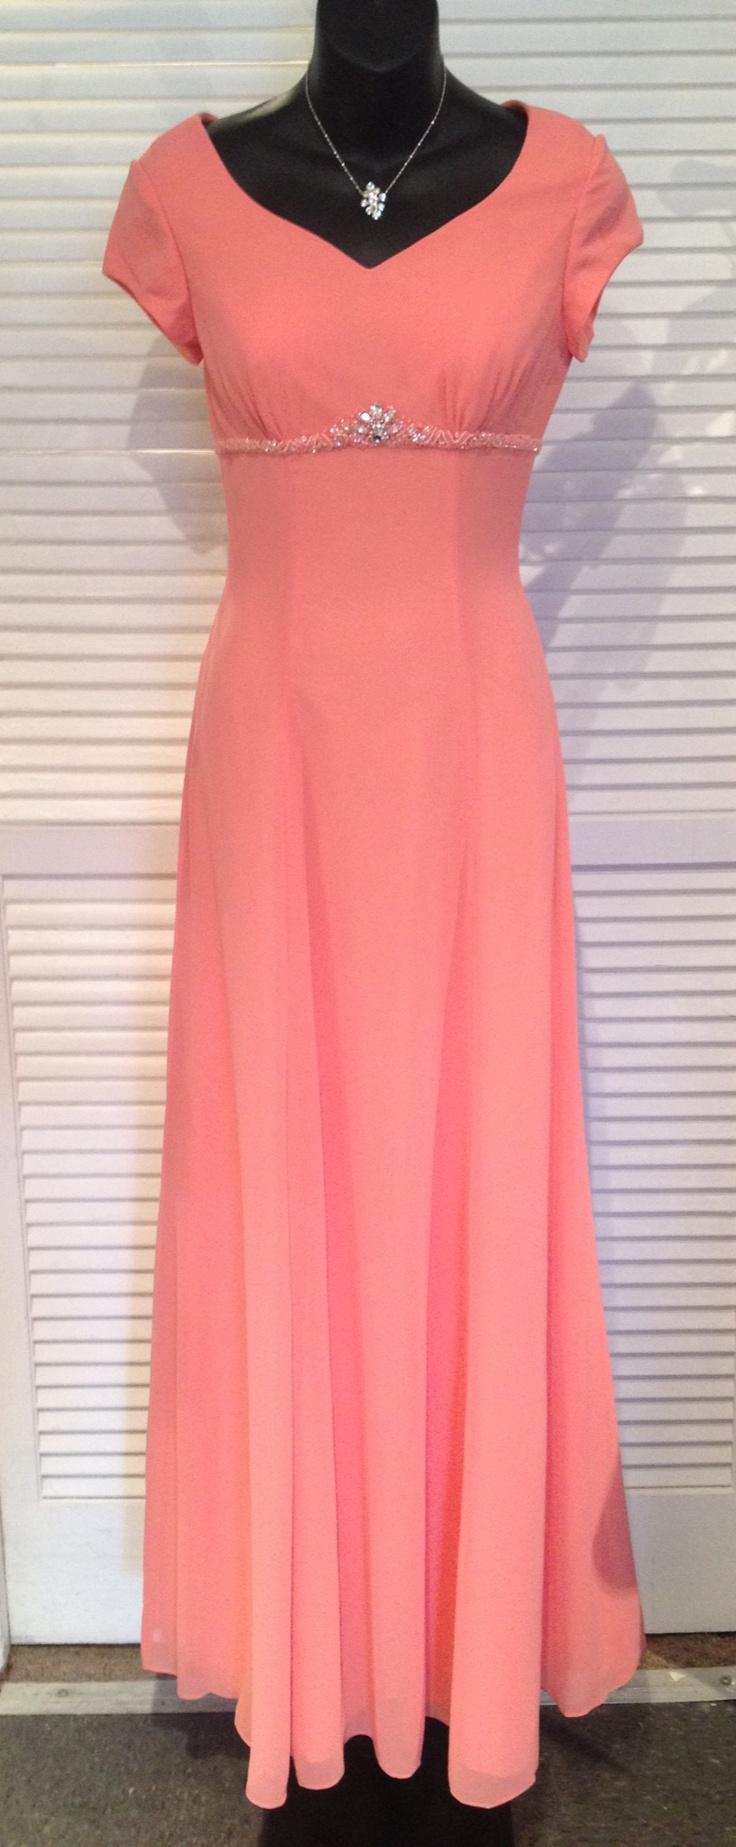 58 best [prom dresses] images on Pinterest | Bridesmaids, Evening ...